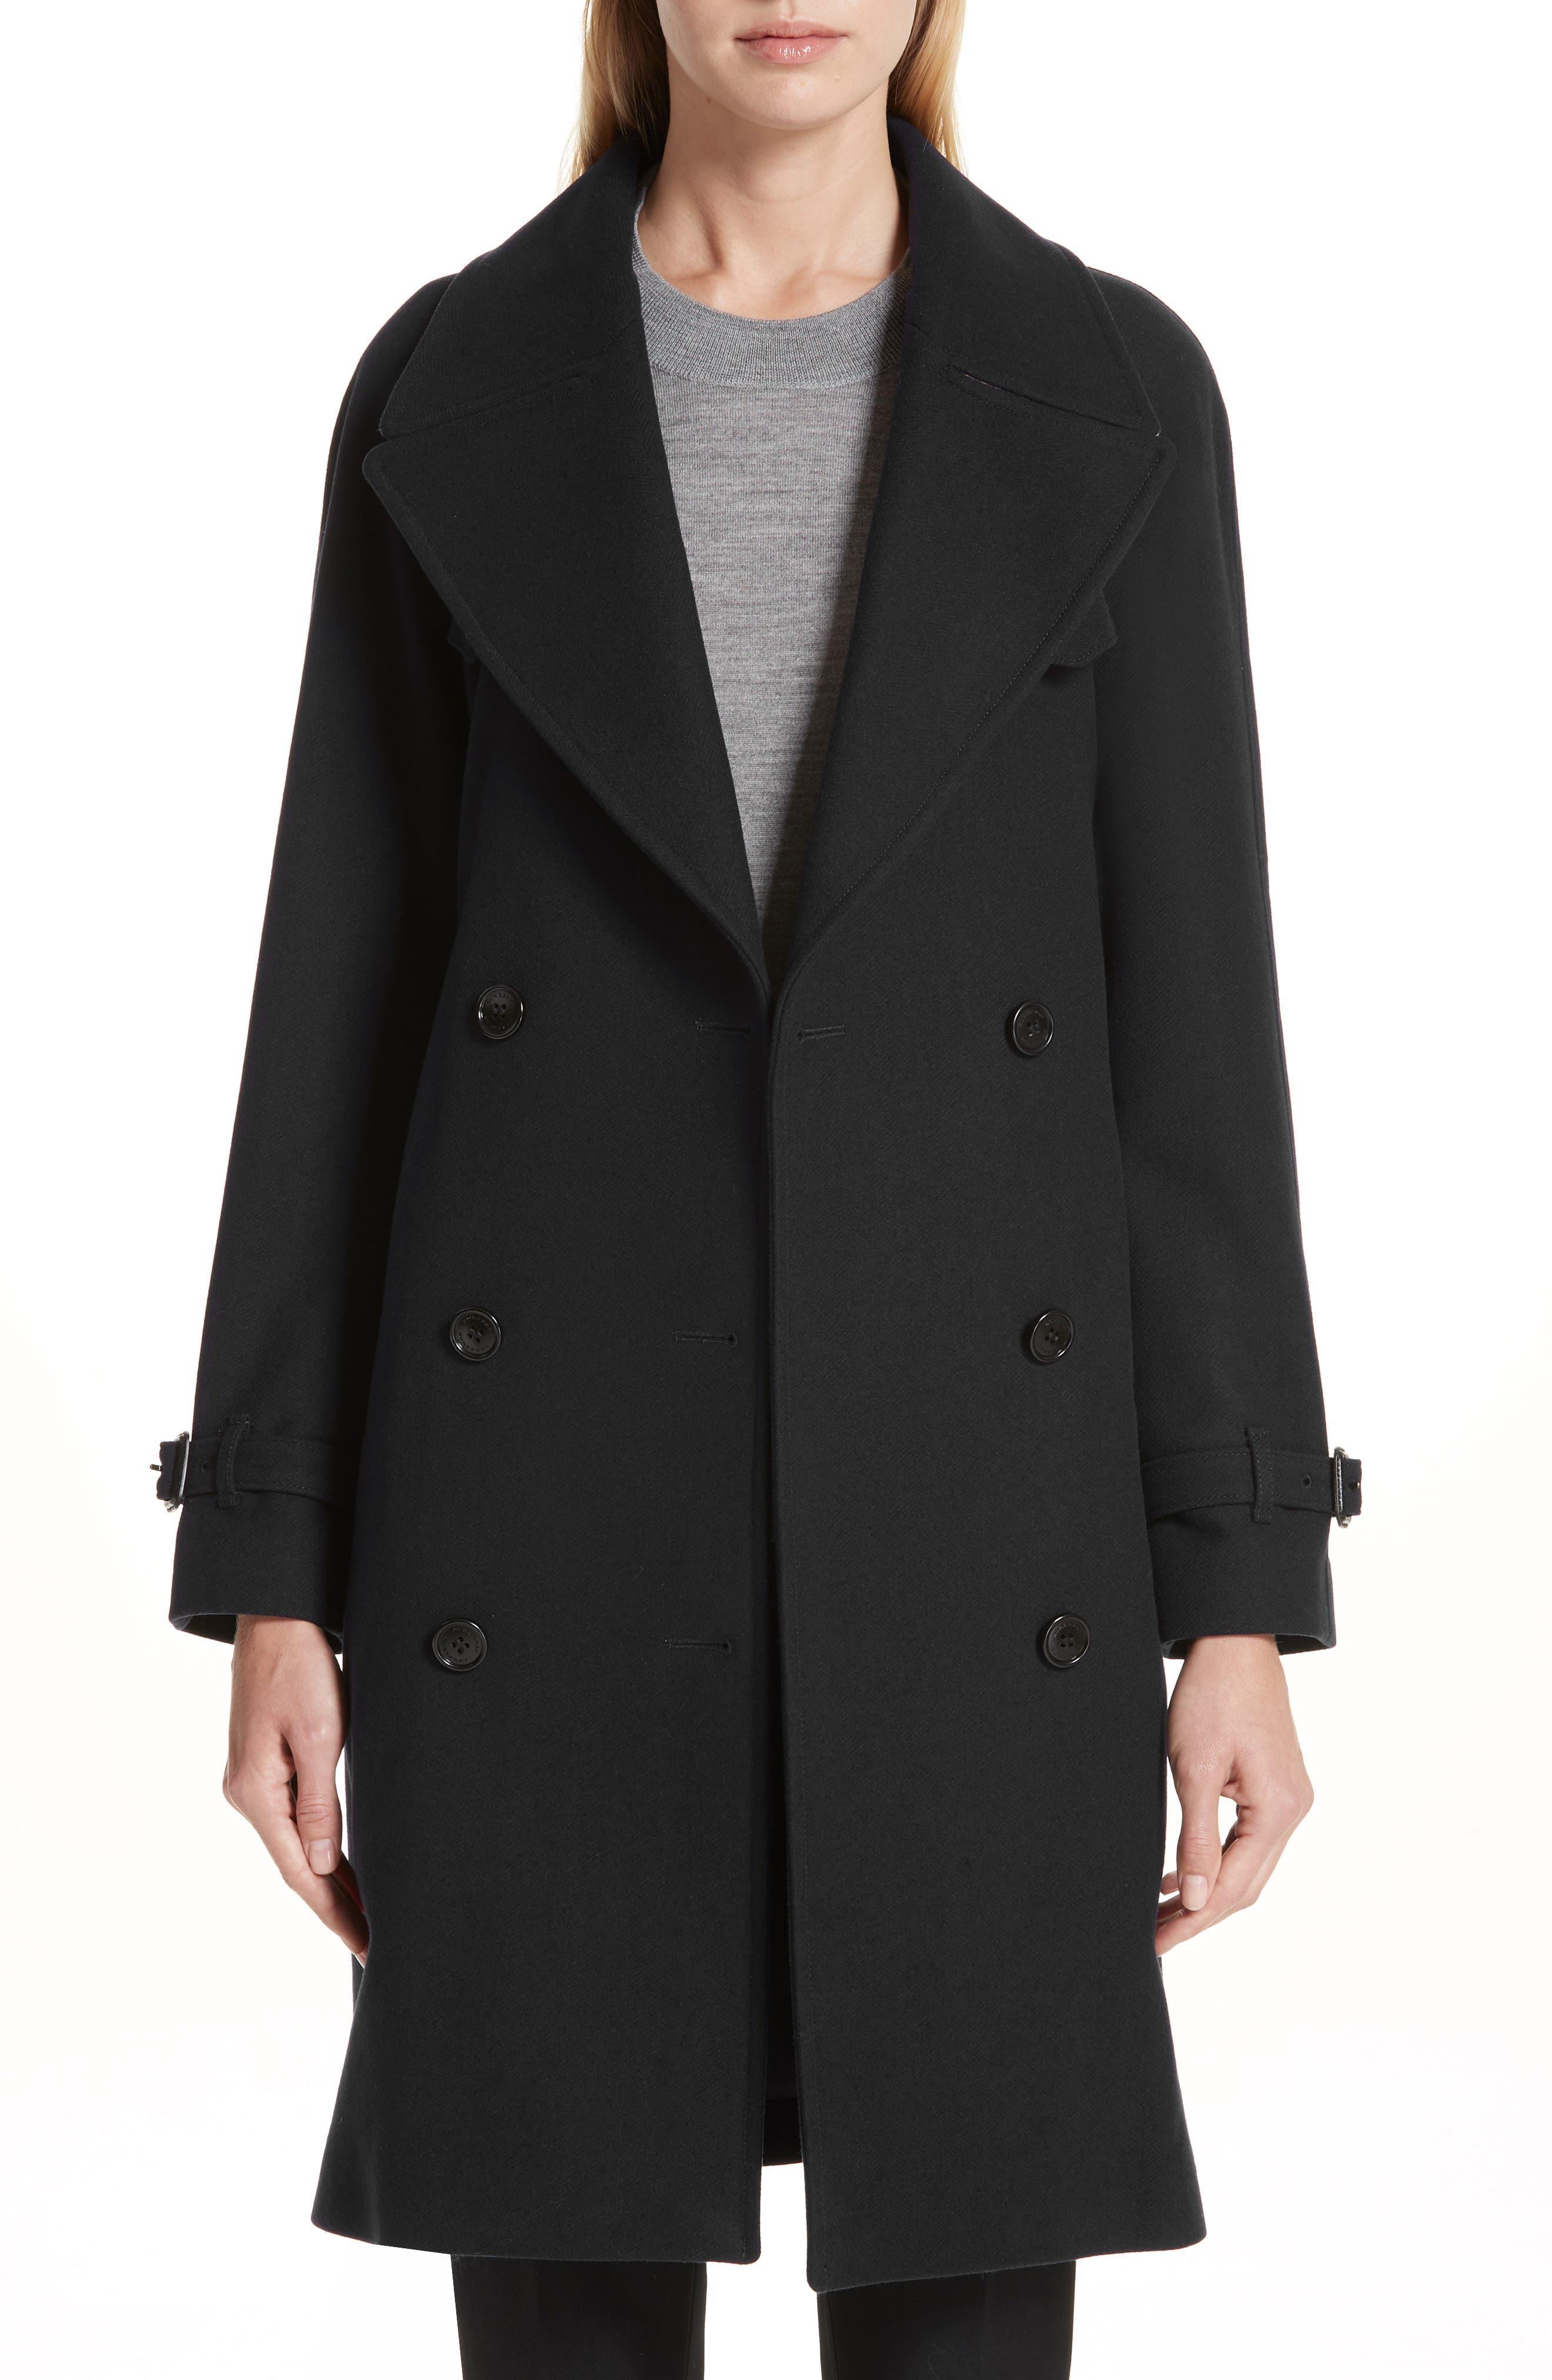 Cranston Wool Blend Trench Coat,                             Main thumbnail 1, color,                             BLACK